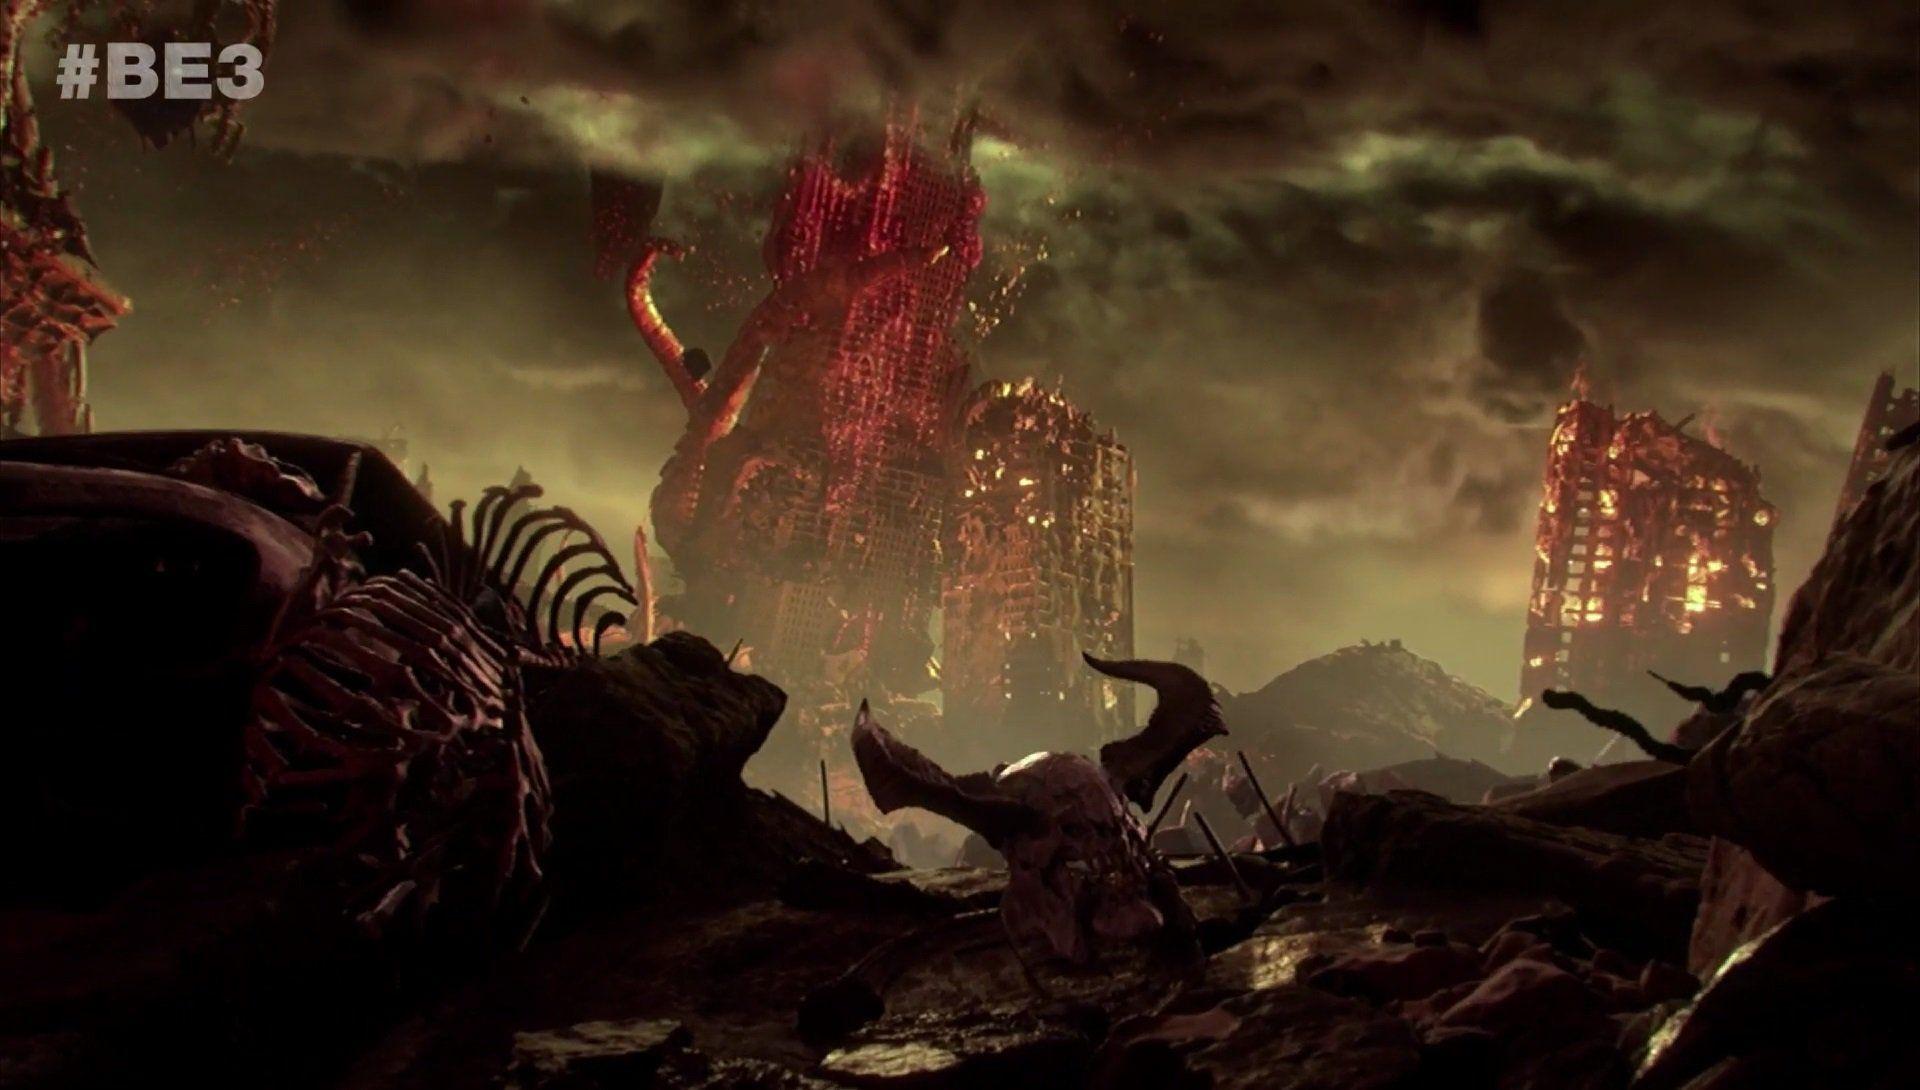 Bethesda E3 2018: DOOM: Eternal Announced | Gaming Articles